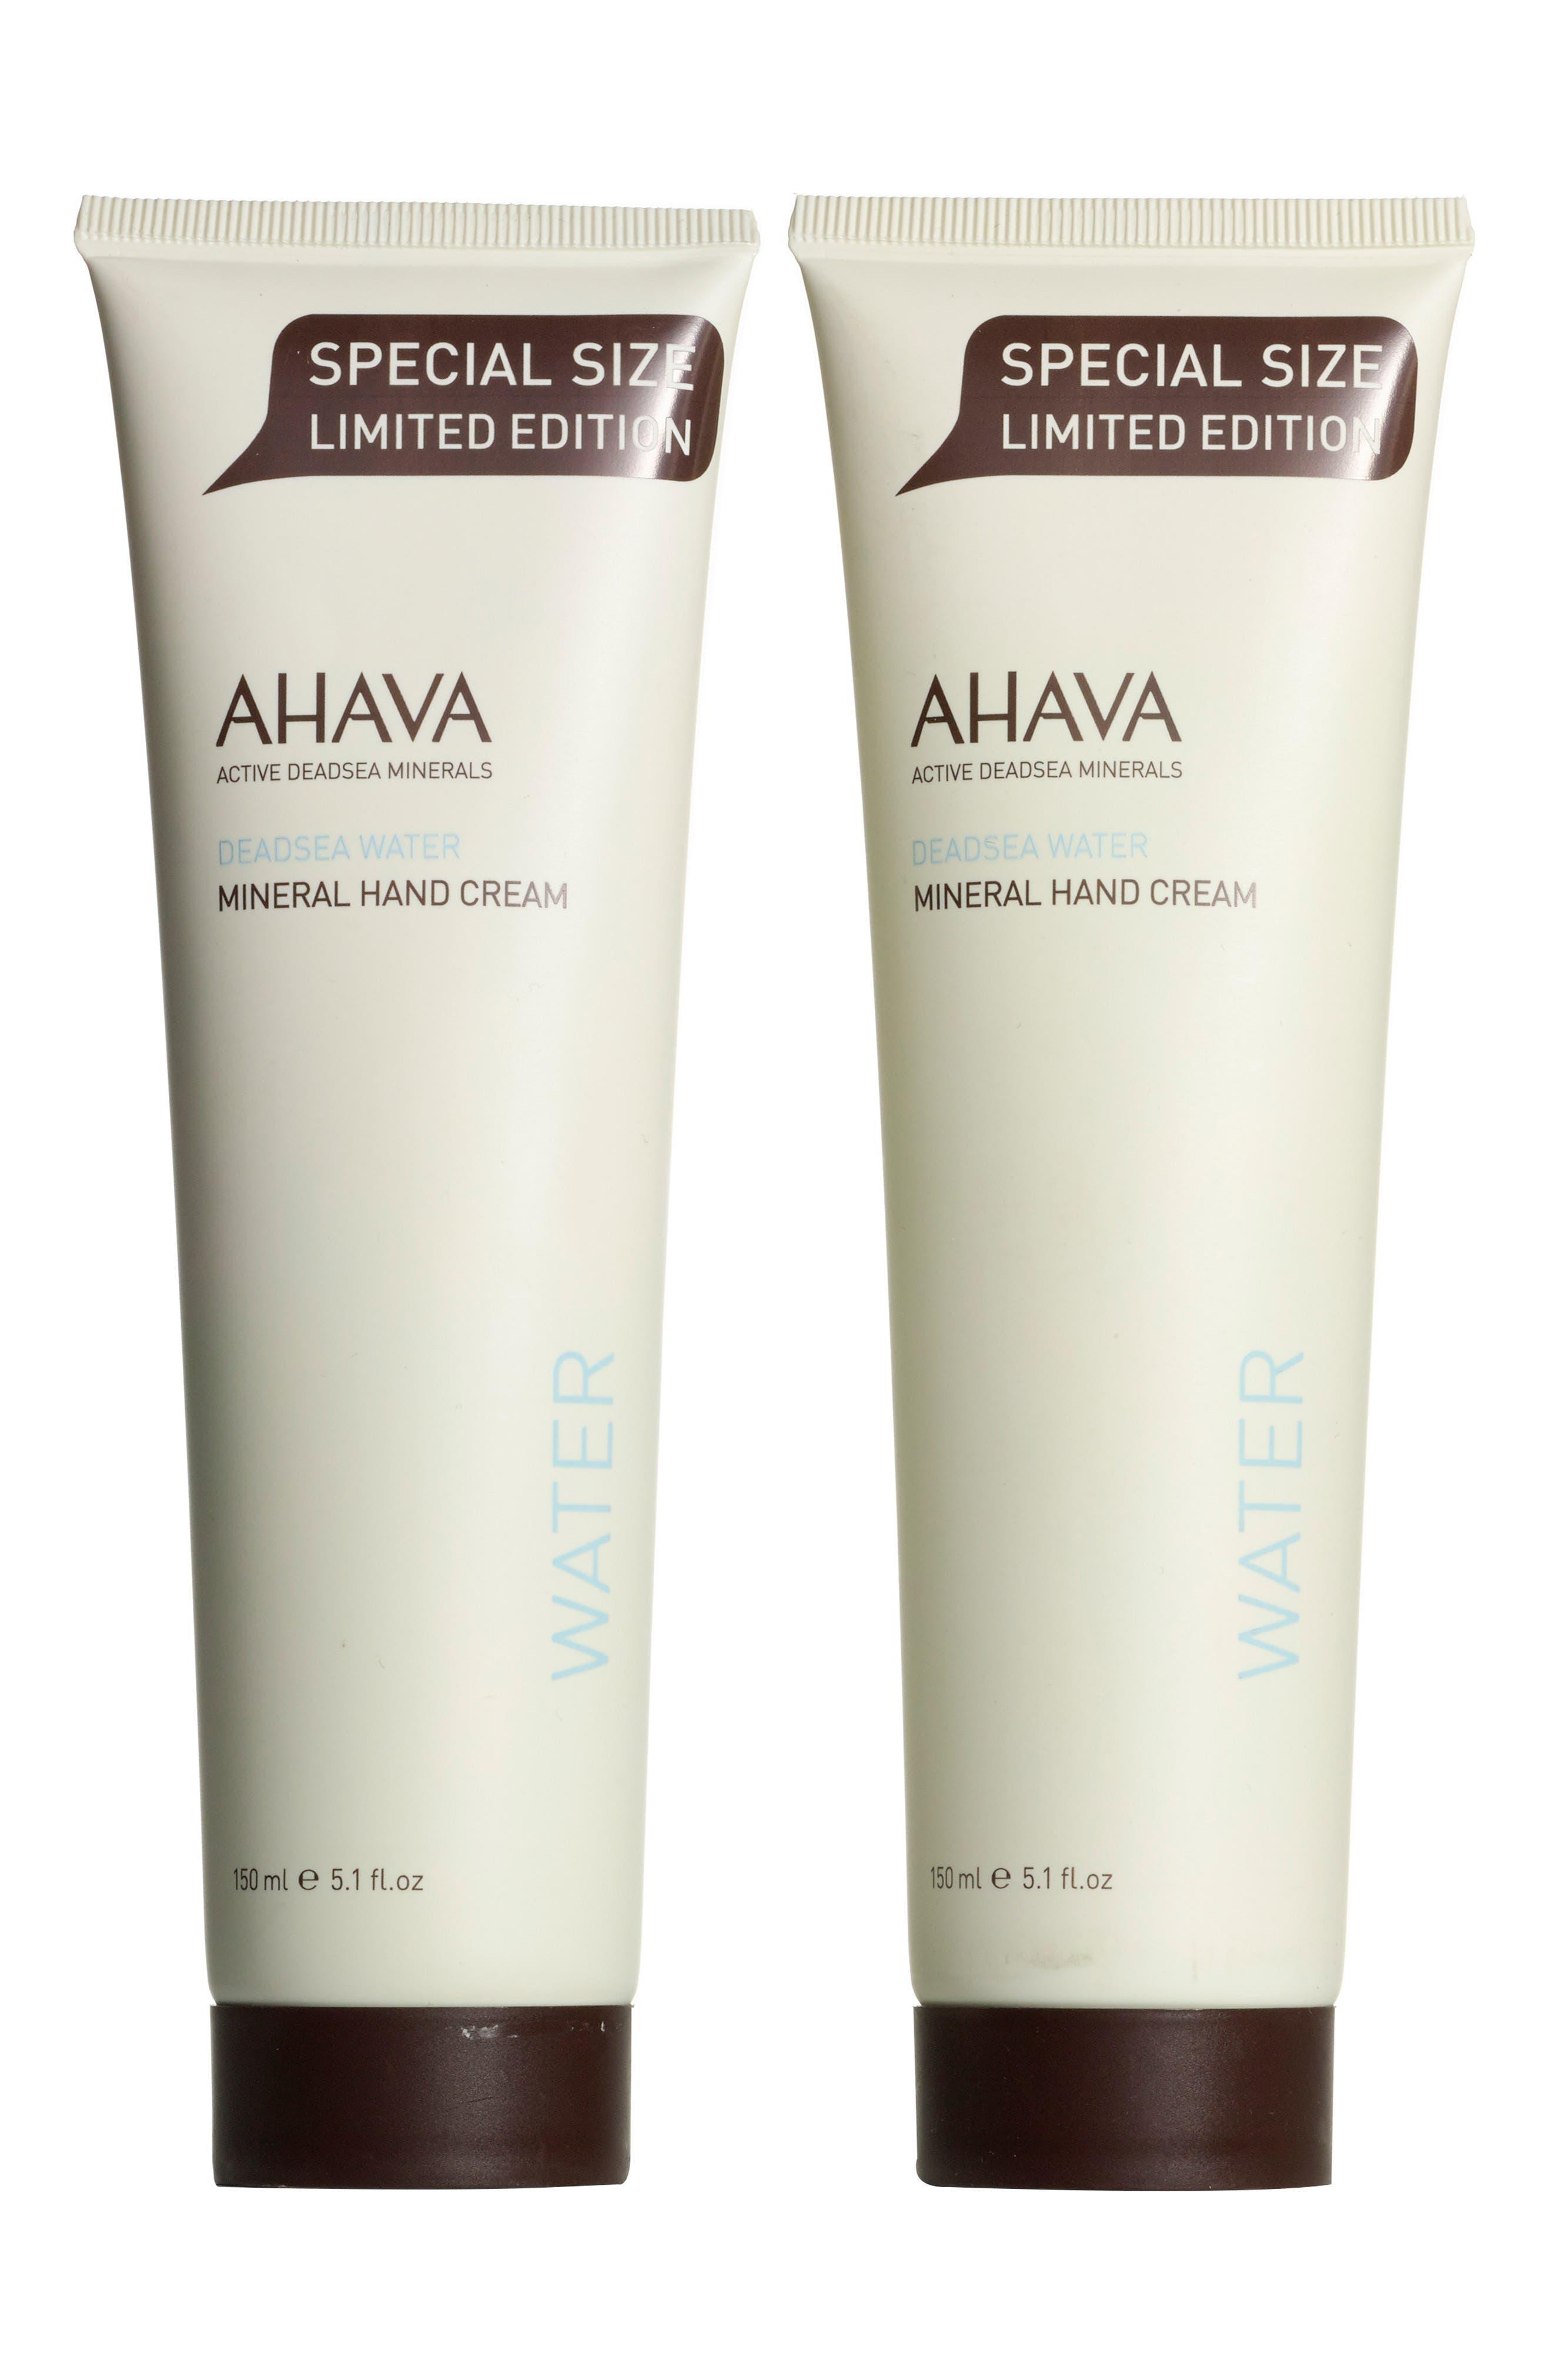 AHAVA Mineral Hand Cream Duo (Nordstrom Exclusive) ($72 Value)